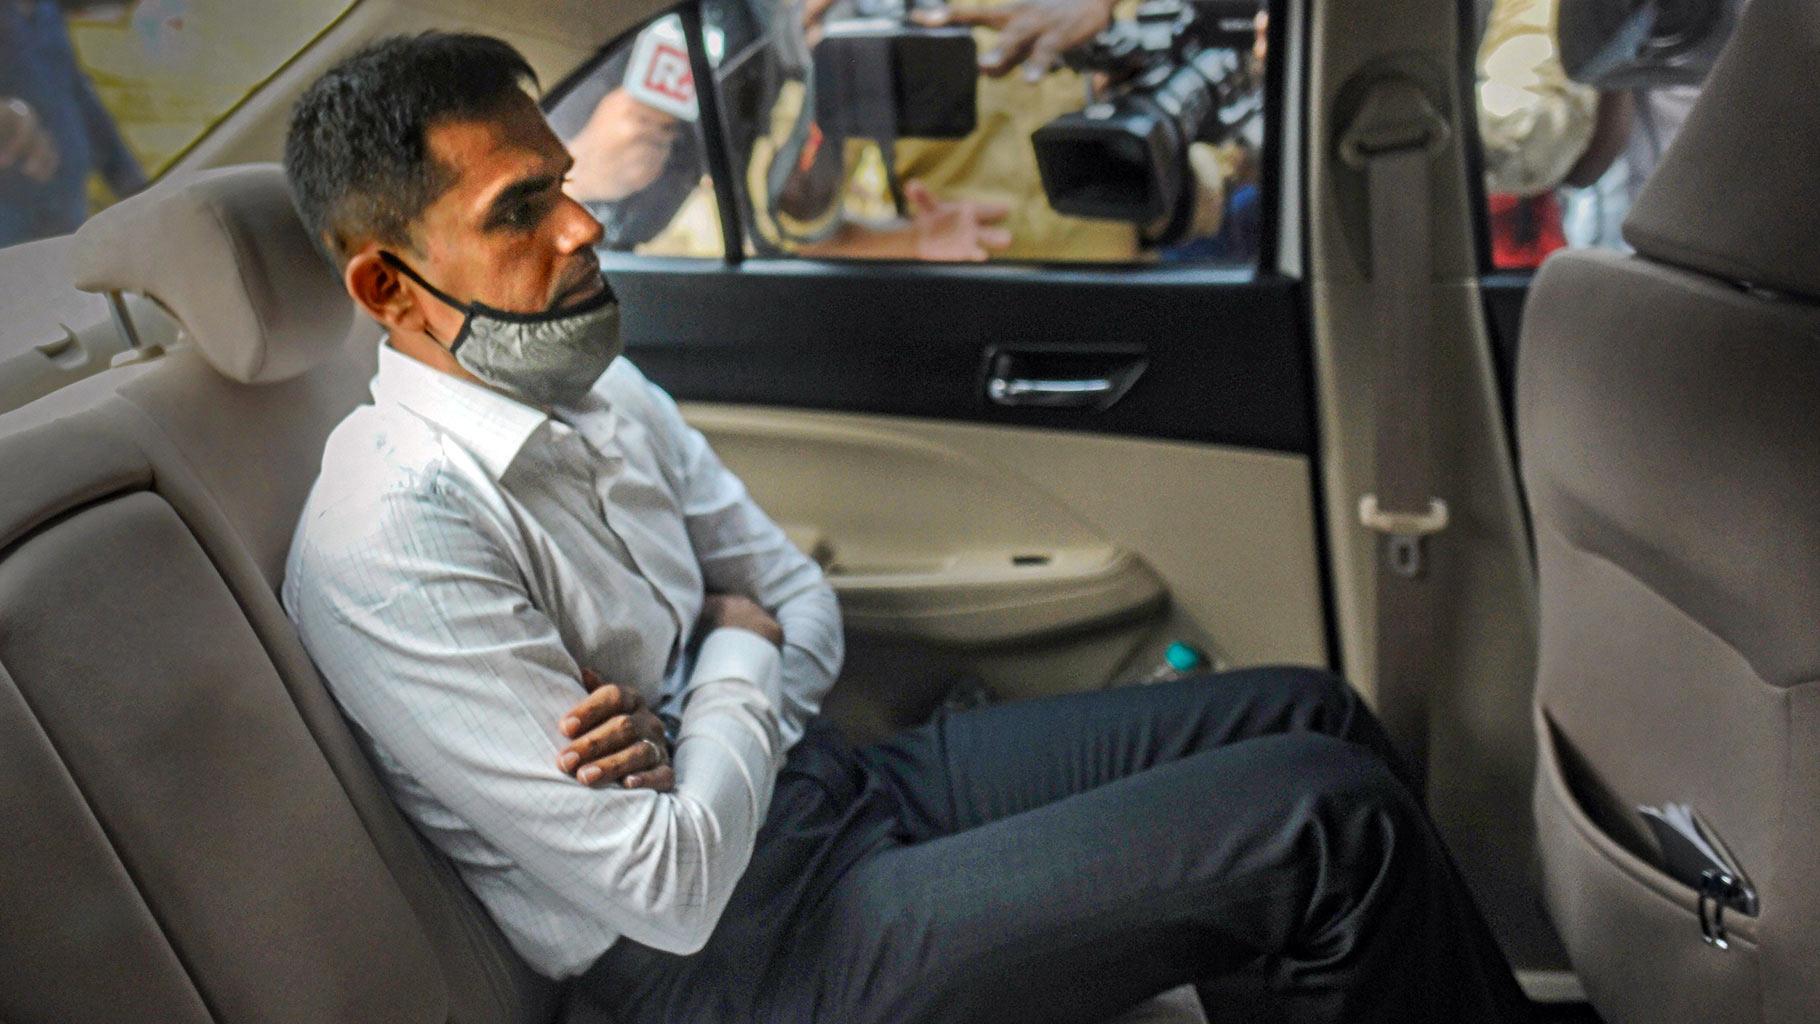 Aryan khan, Mumbai drug bust, Drugs raid, Sameerwankhede